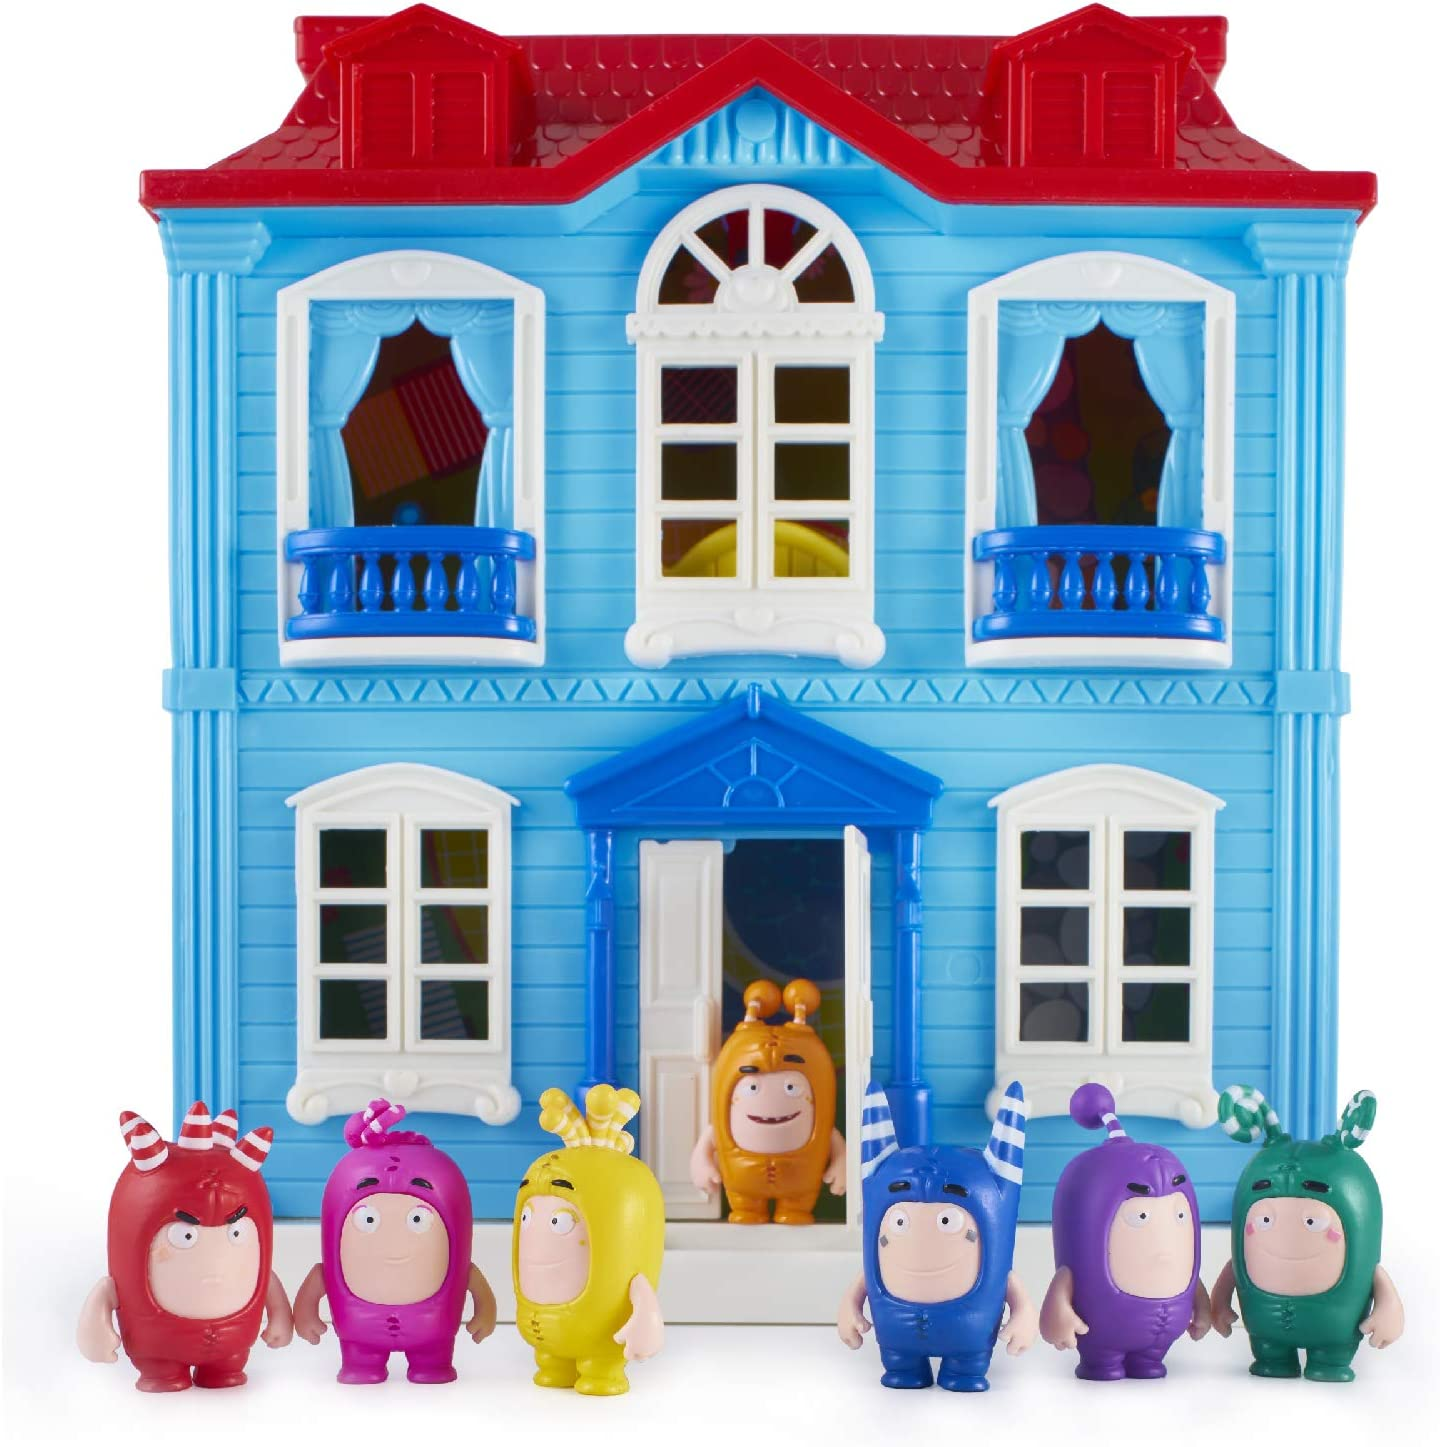 Oddbods Set of 7 Figures Toys Brand New